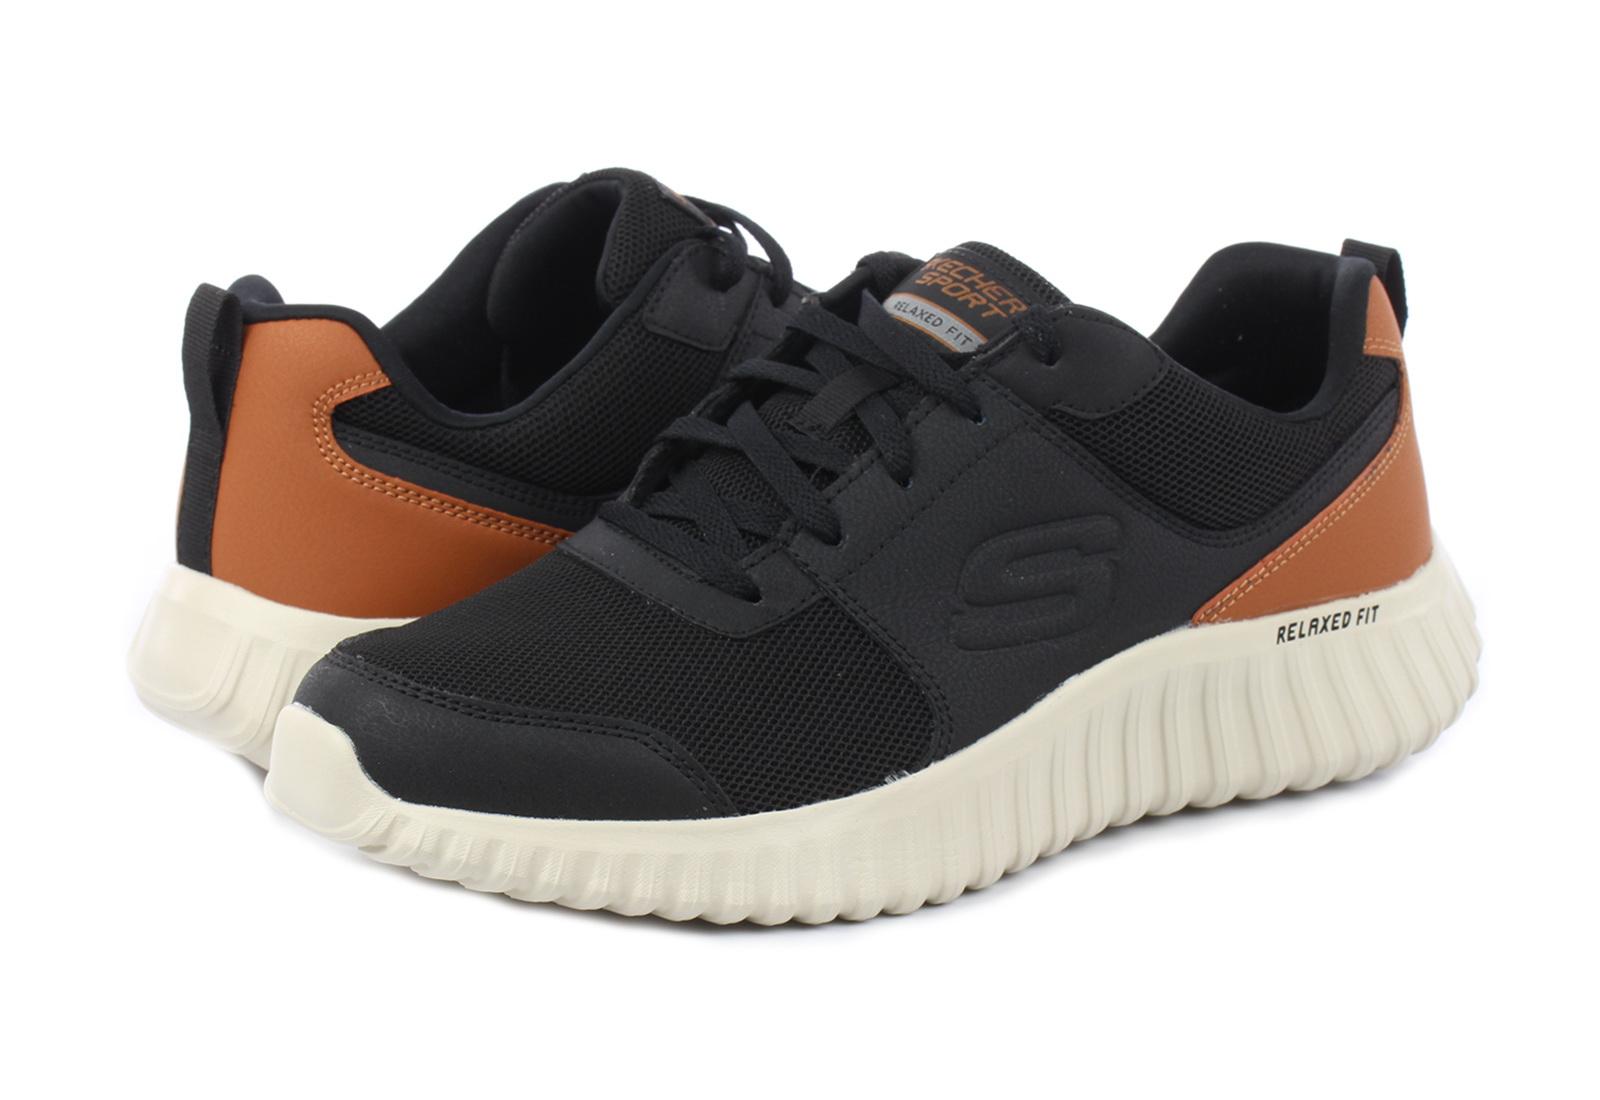 Skechers Pantofi Depth Charge 2.0 - Winkko